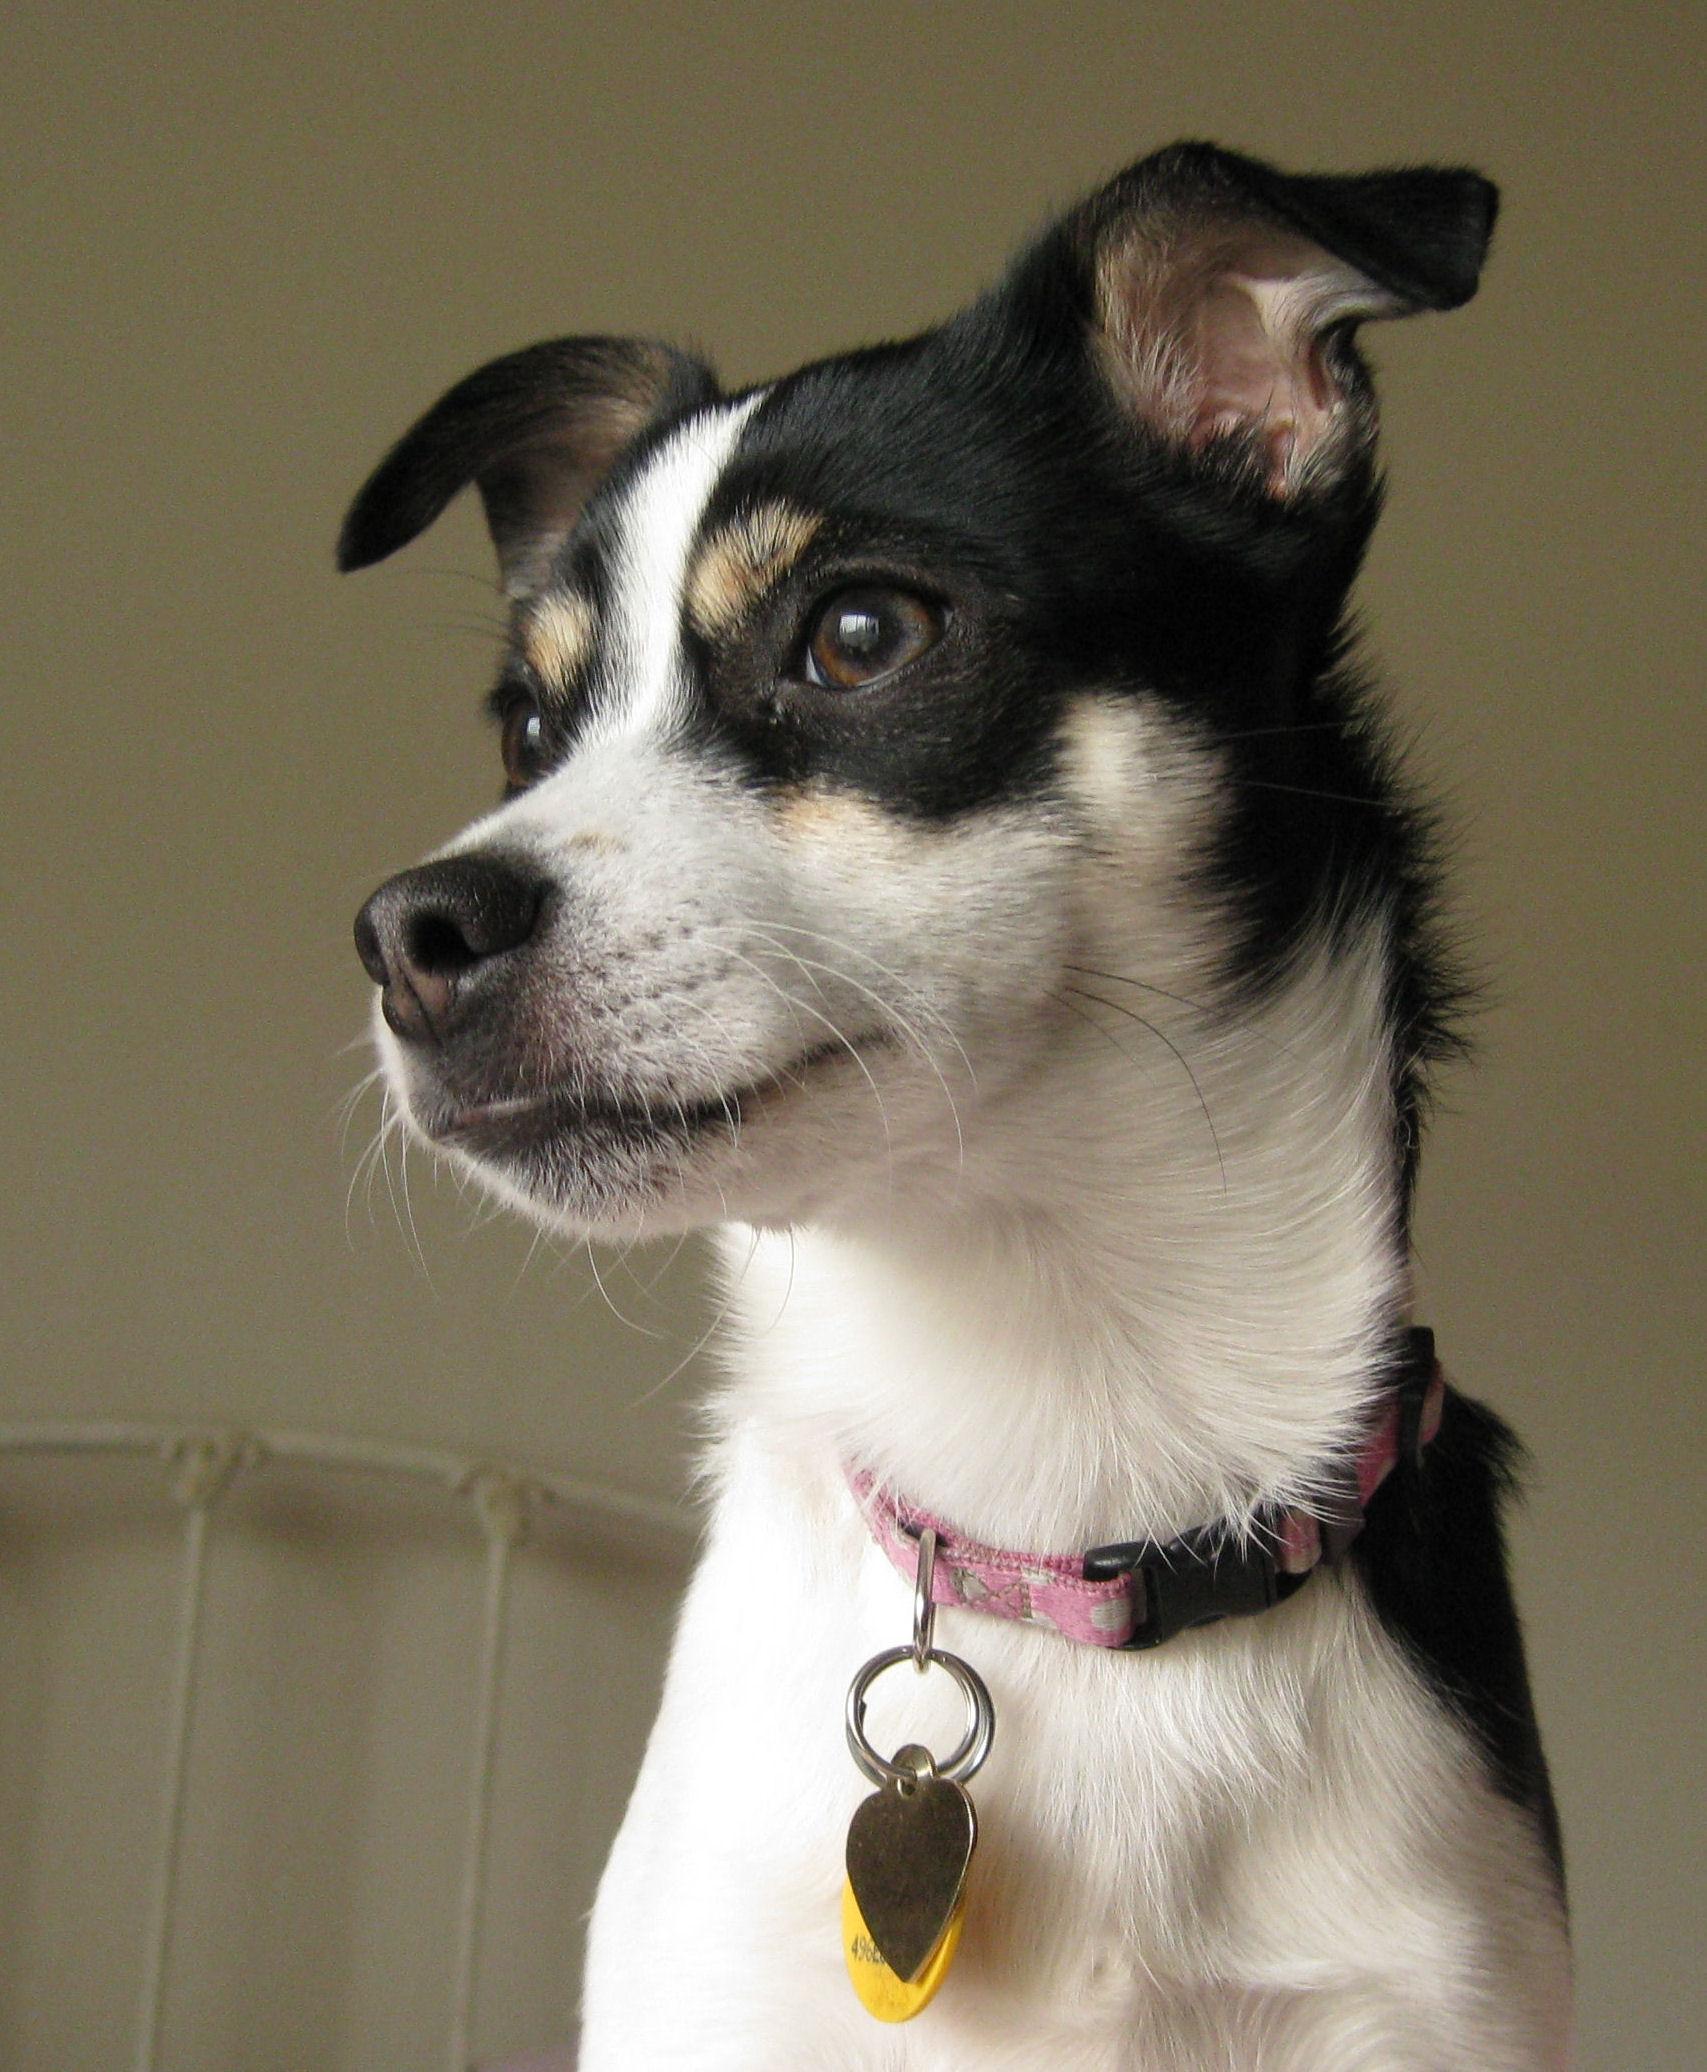 Rat Terrier Dog: Rat Rat Terrier Dog Face Breed